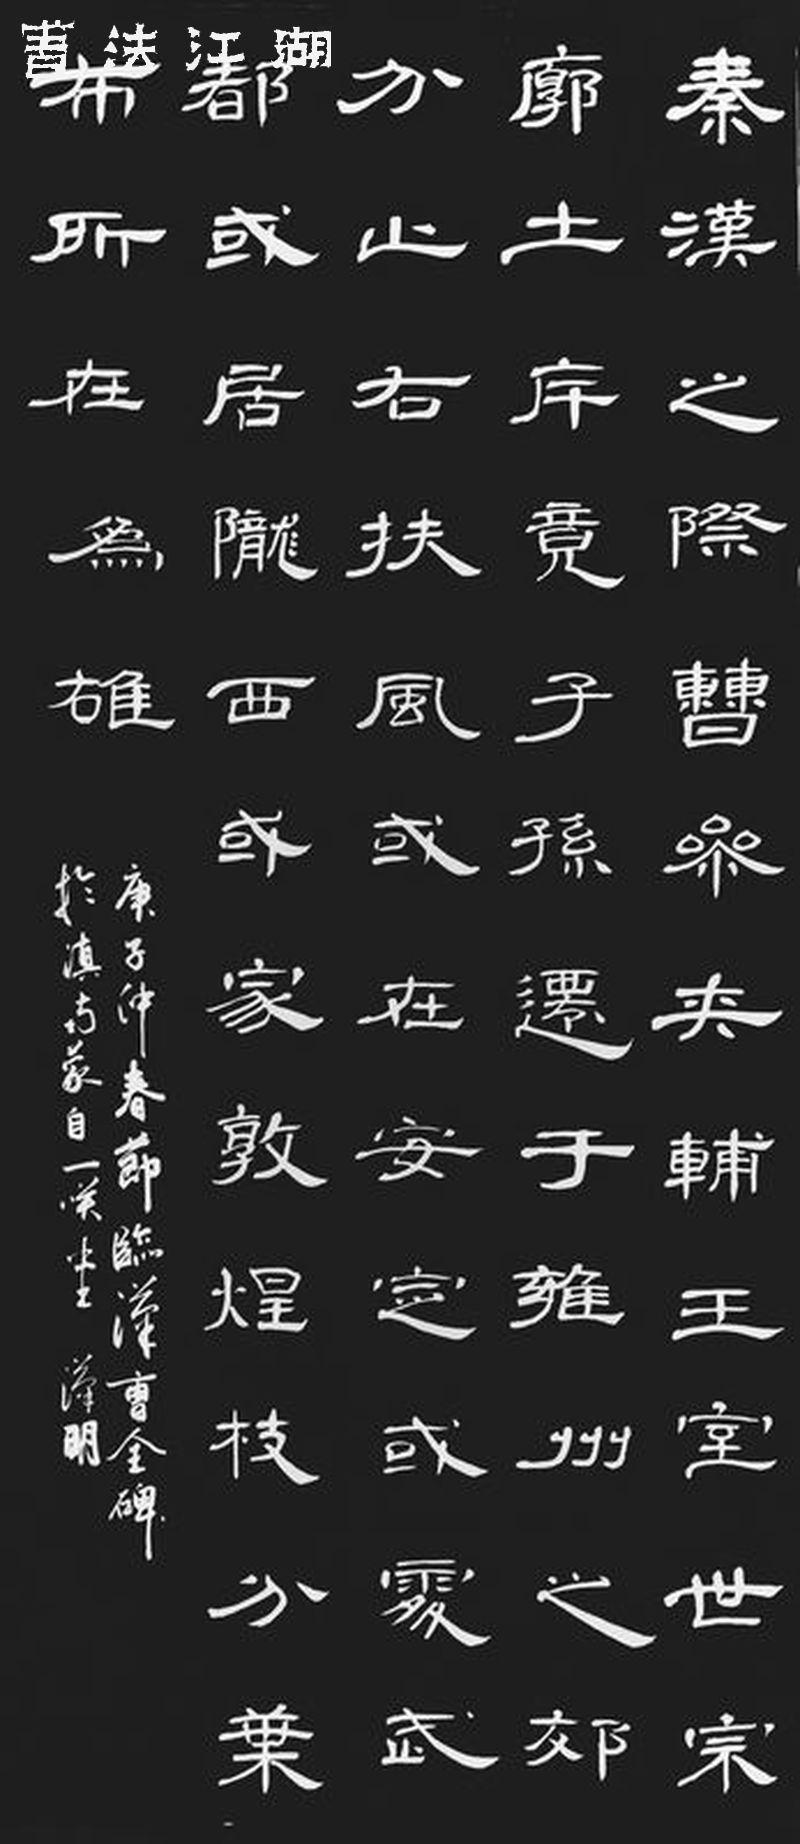 nEO_IMG_节临曹全反色.jpg